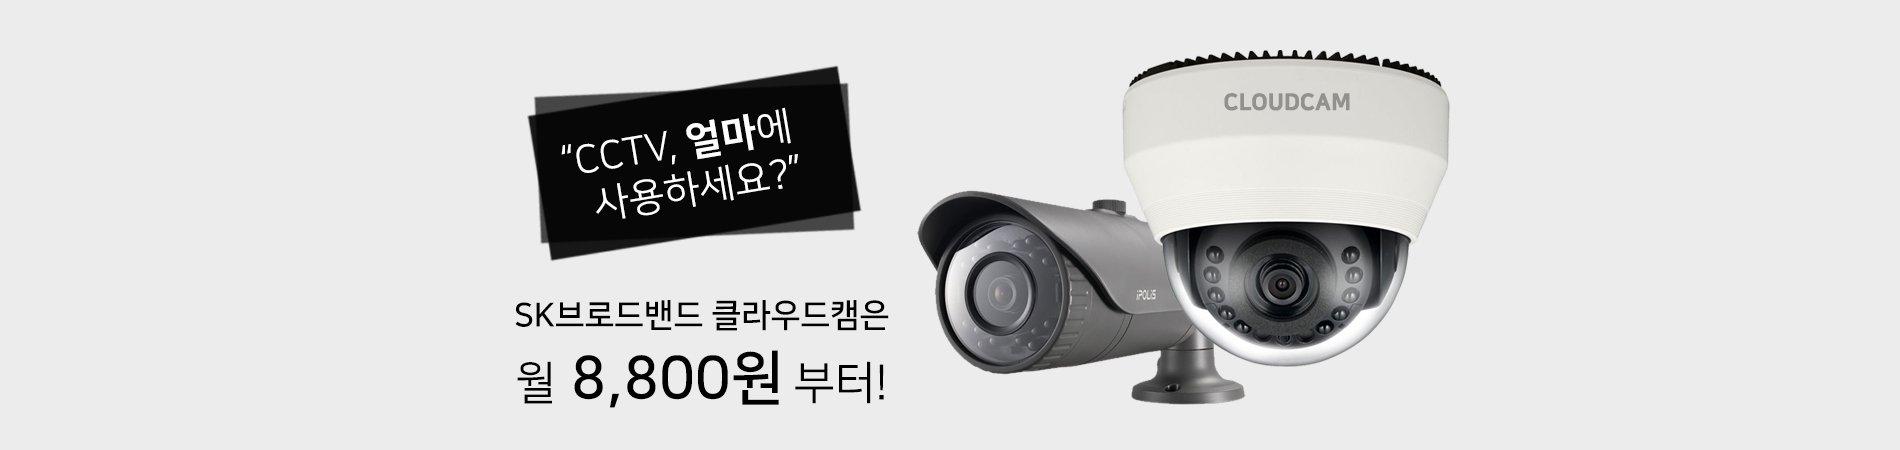 home2 1 - SK클라우드캠 온라인 가입센터